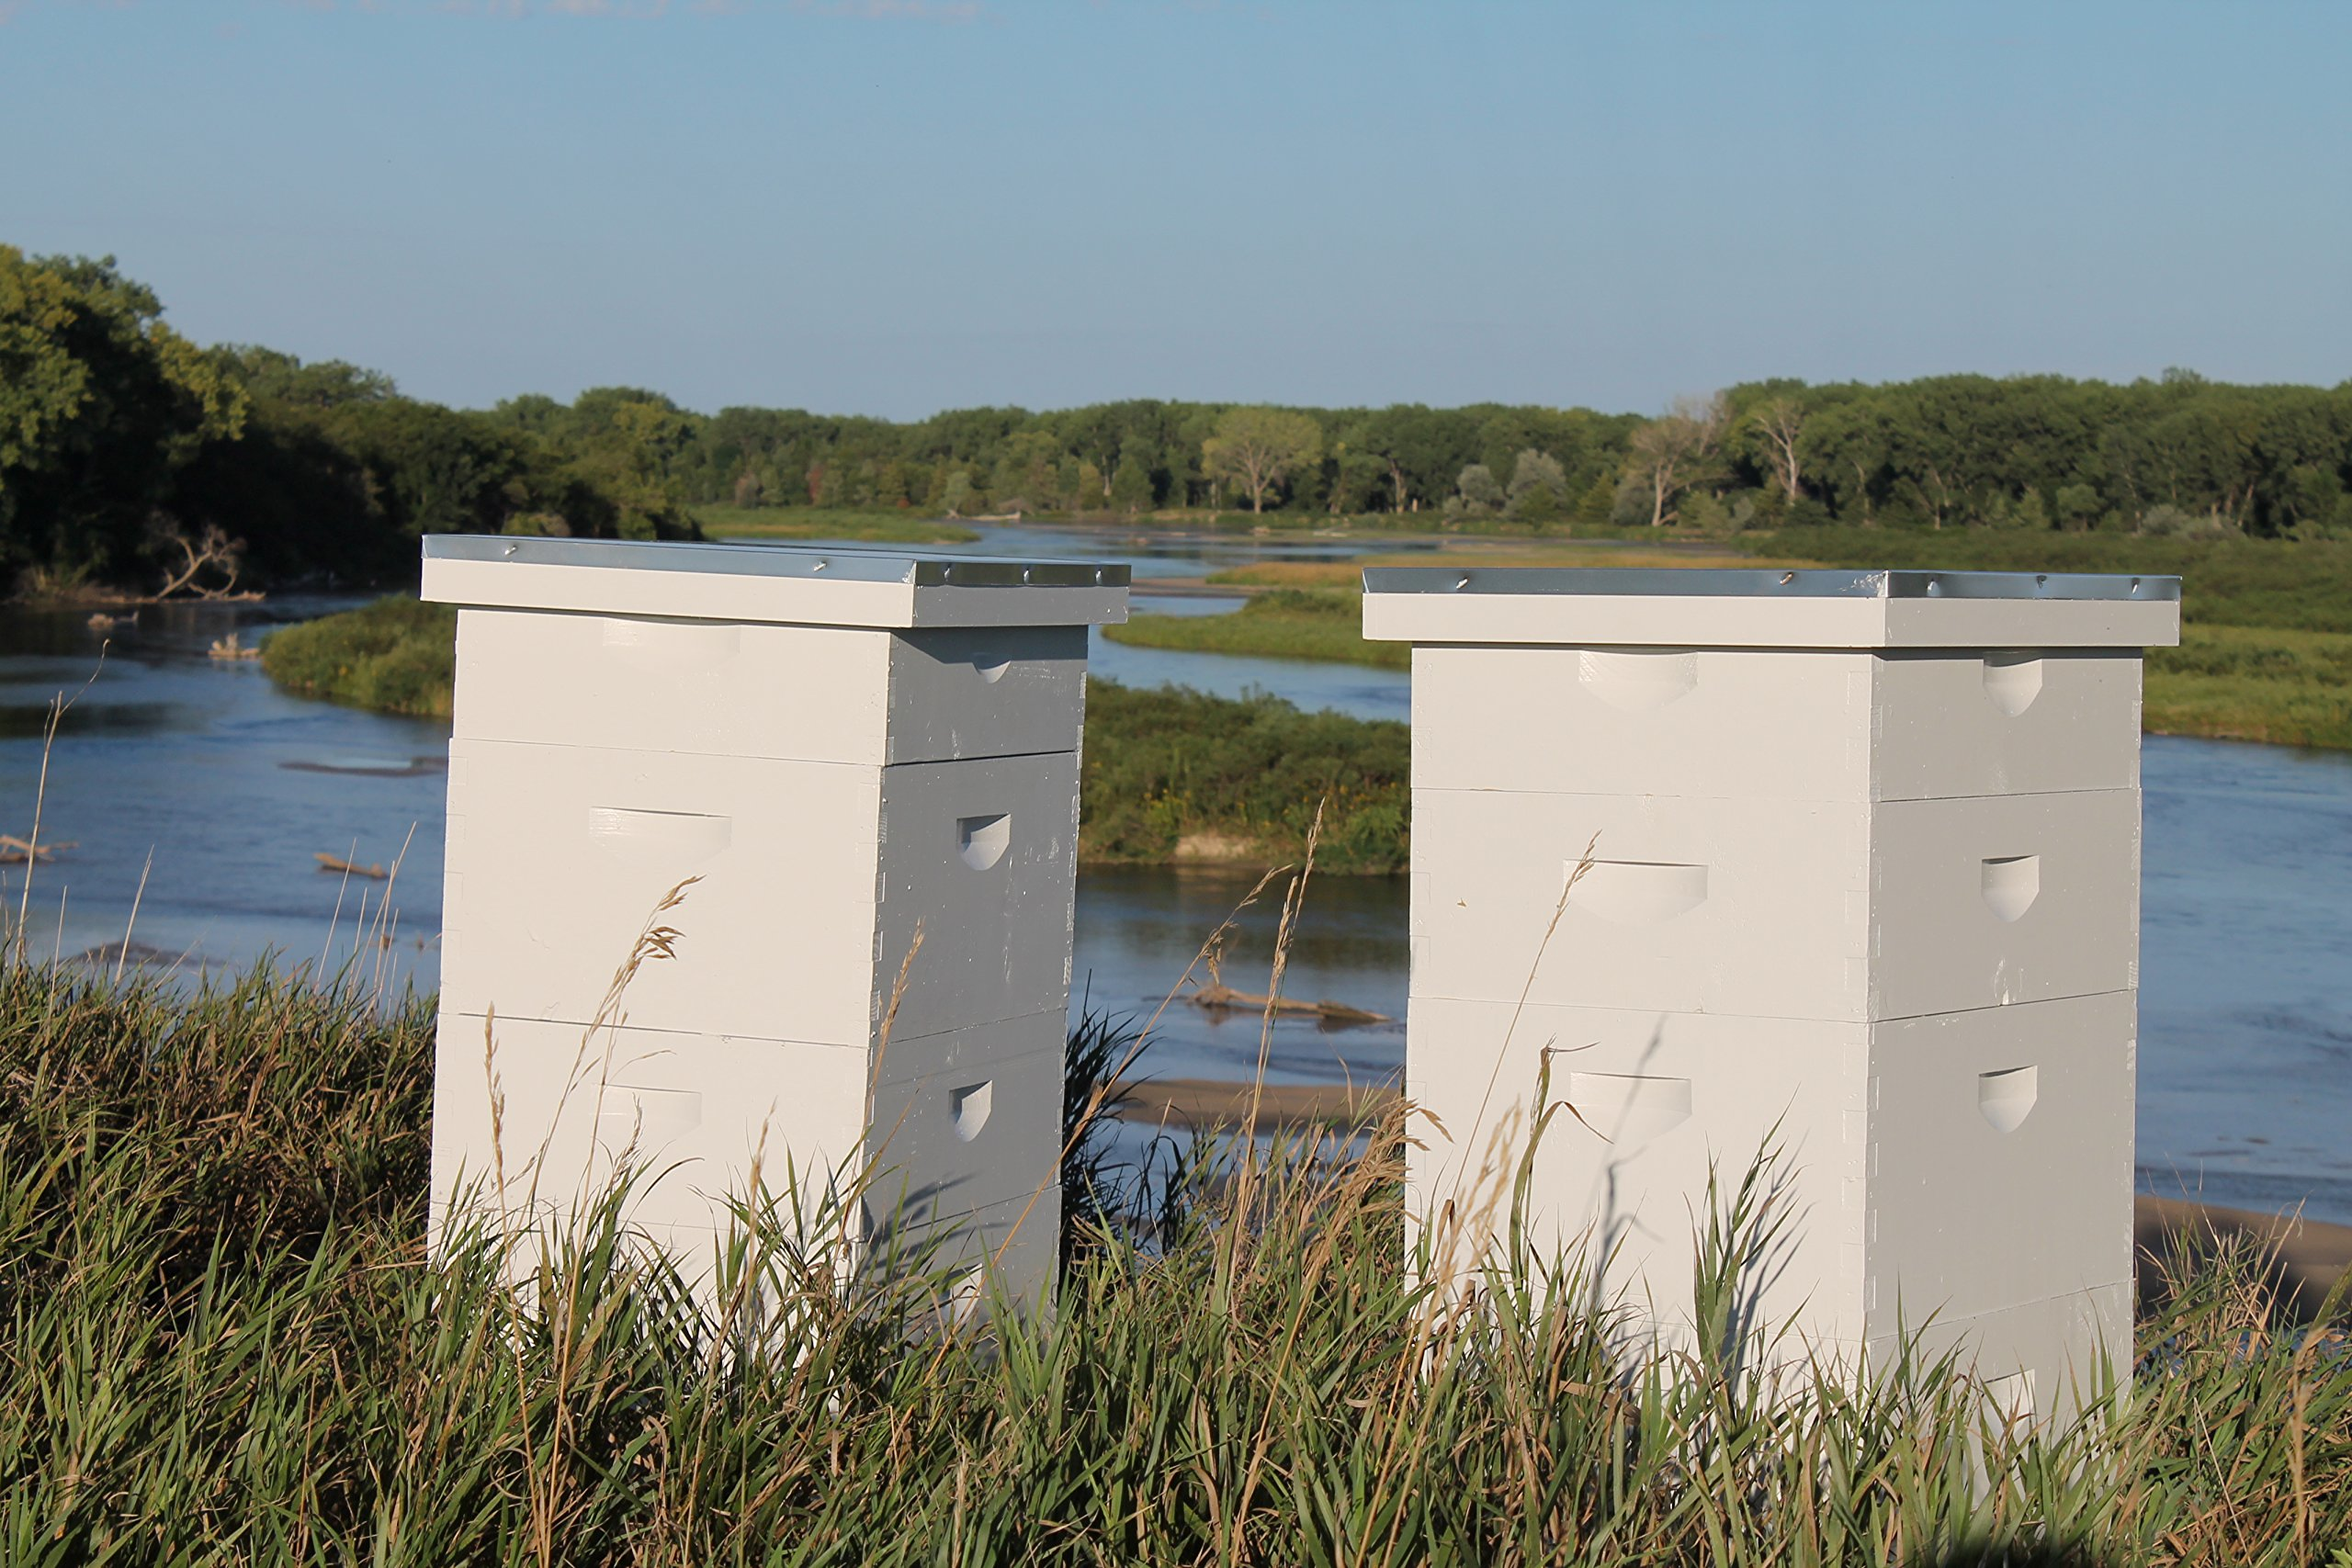 Raw Honey Pure Natural Nebraska Honey One 2lb Jar by Prairie River Honey Farm (Image #6)